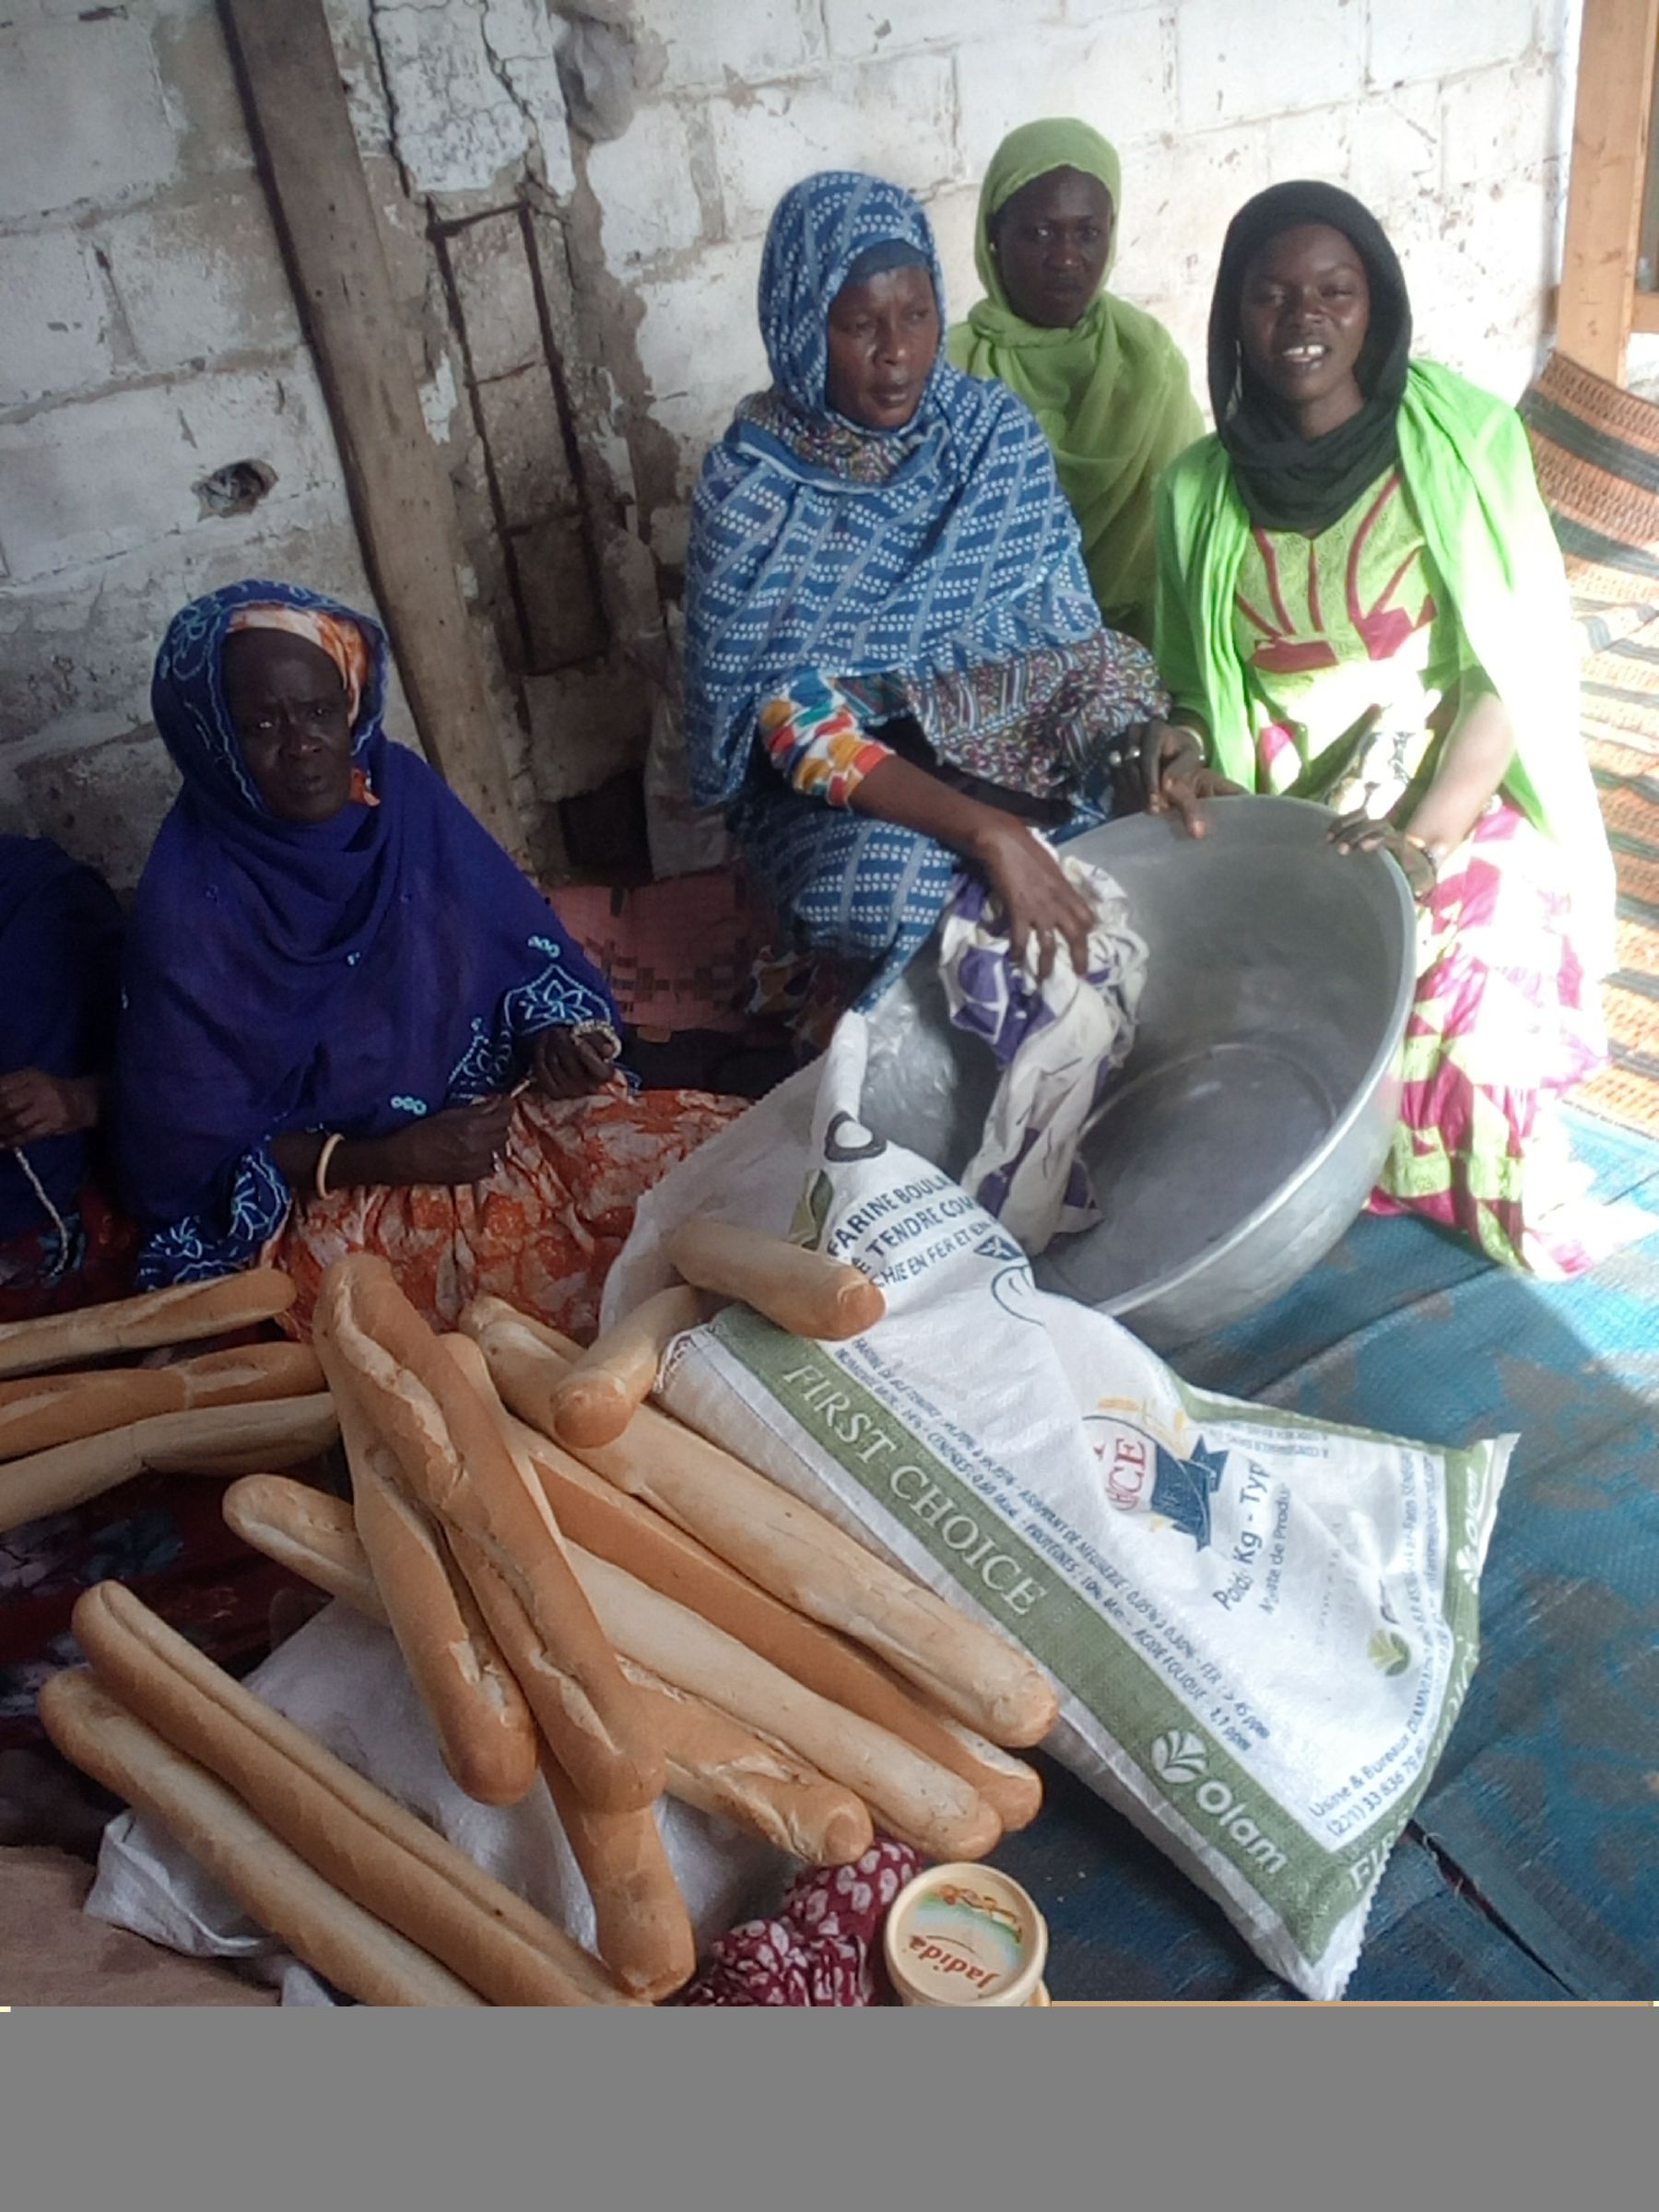 Mosquée « Massalikoul Jinaan » de Dakar : 400 à 500 mille FCfa pour chaque « Ndogou »